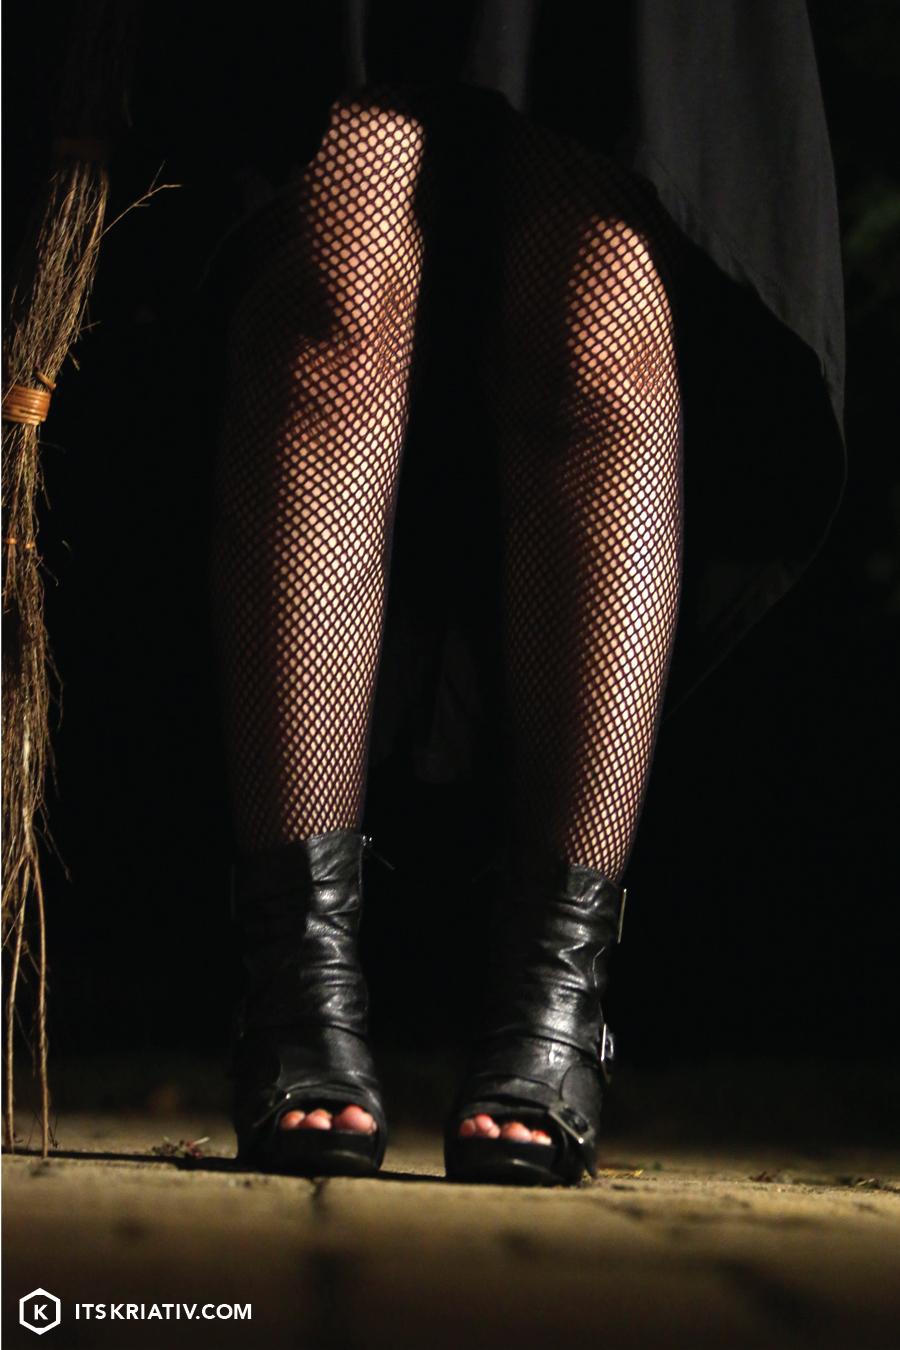 Oct_13_Fashion-Halloween-Witch-01a-05.jpg